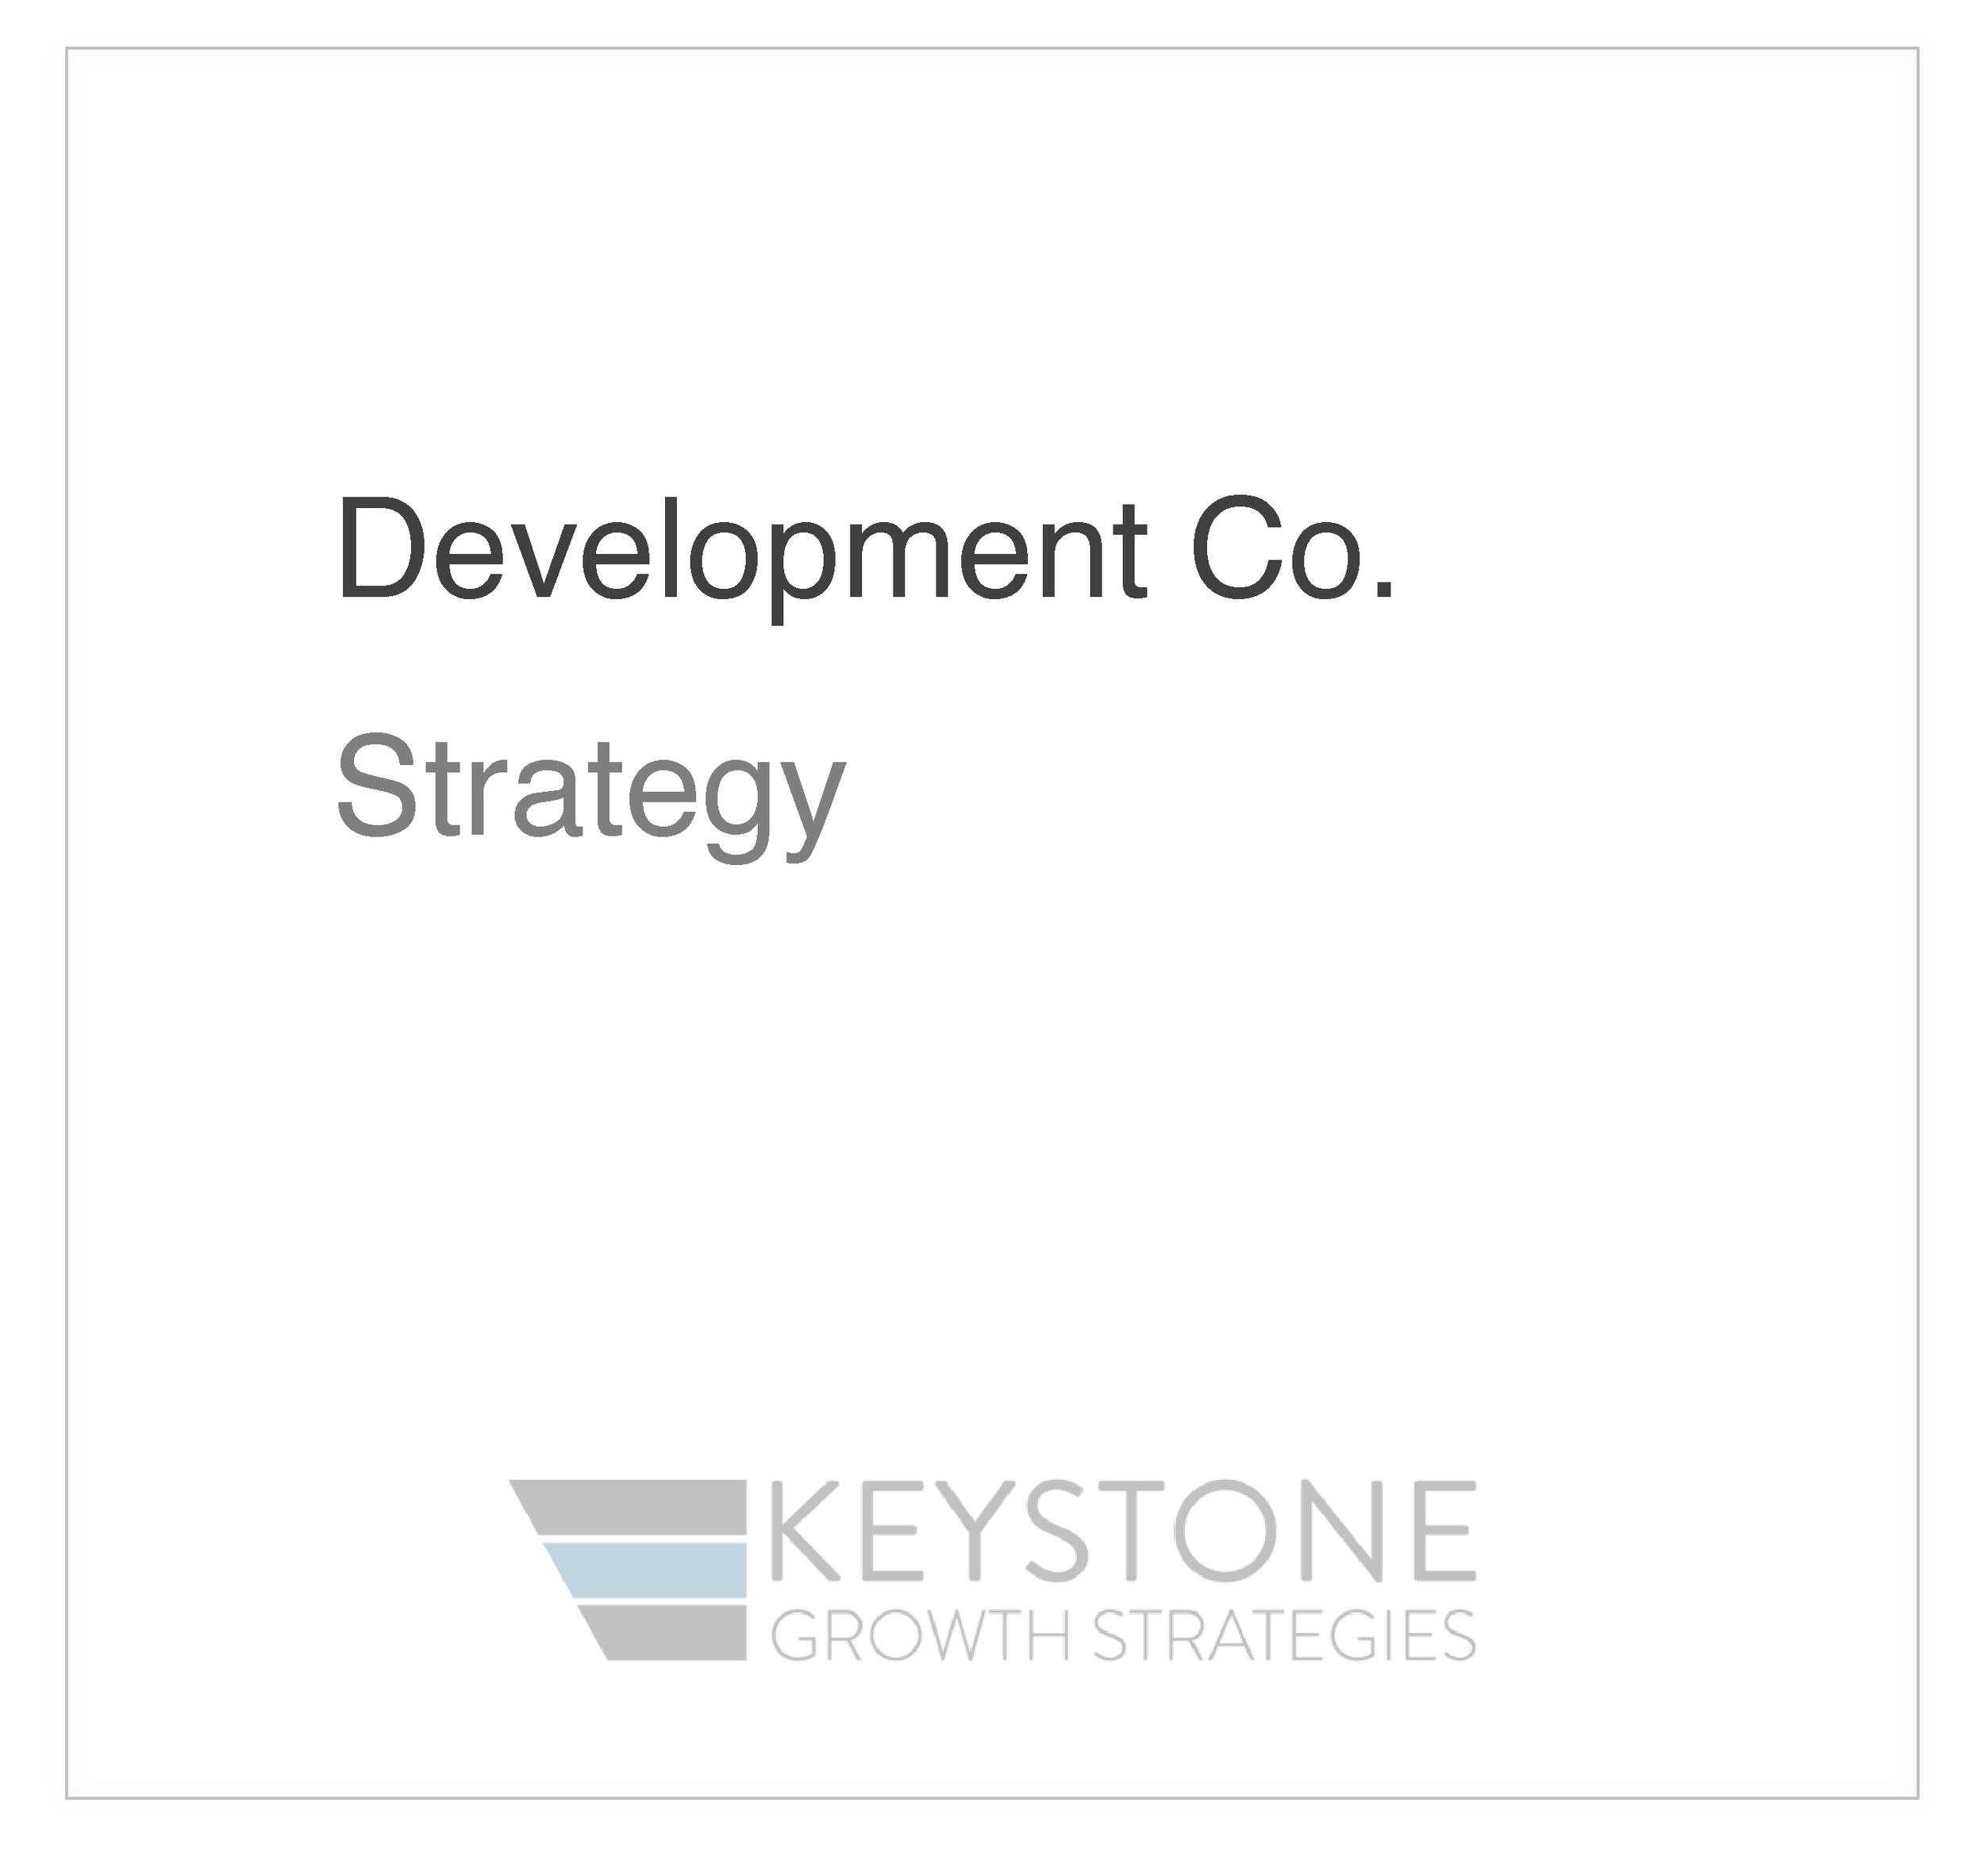 Development Co-11.png